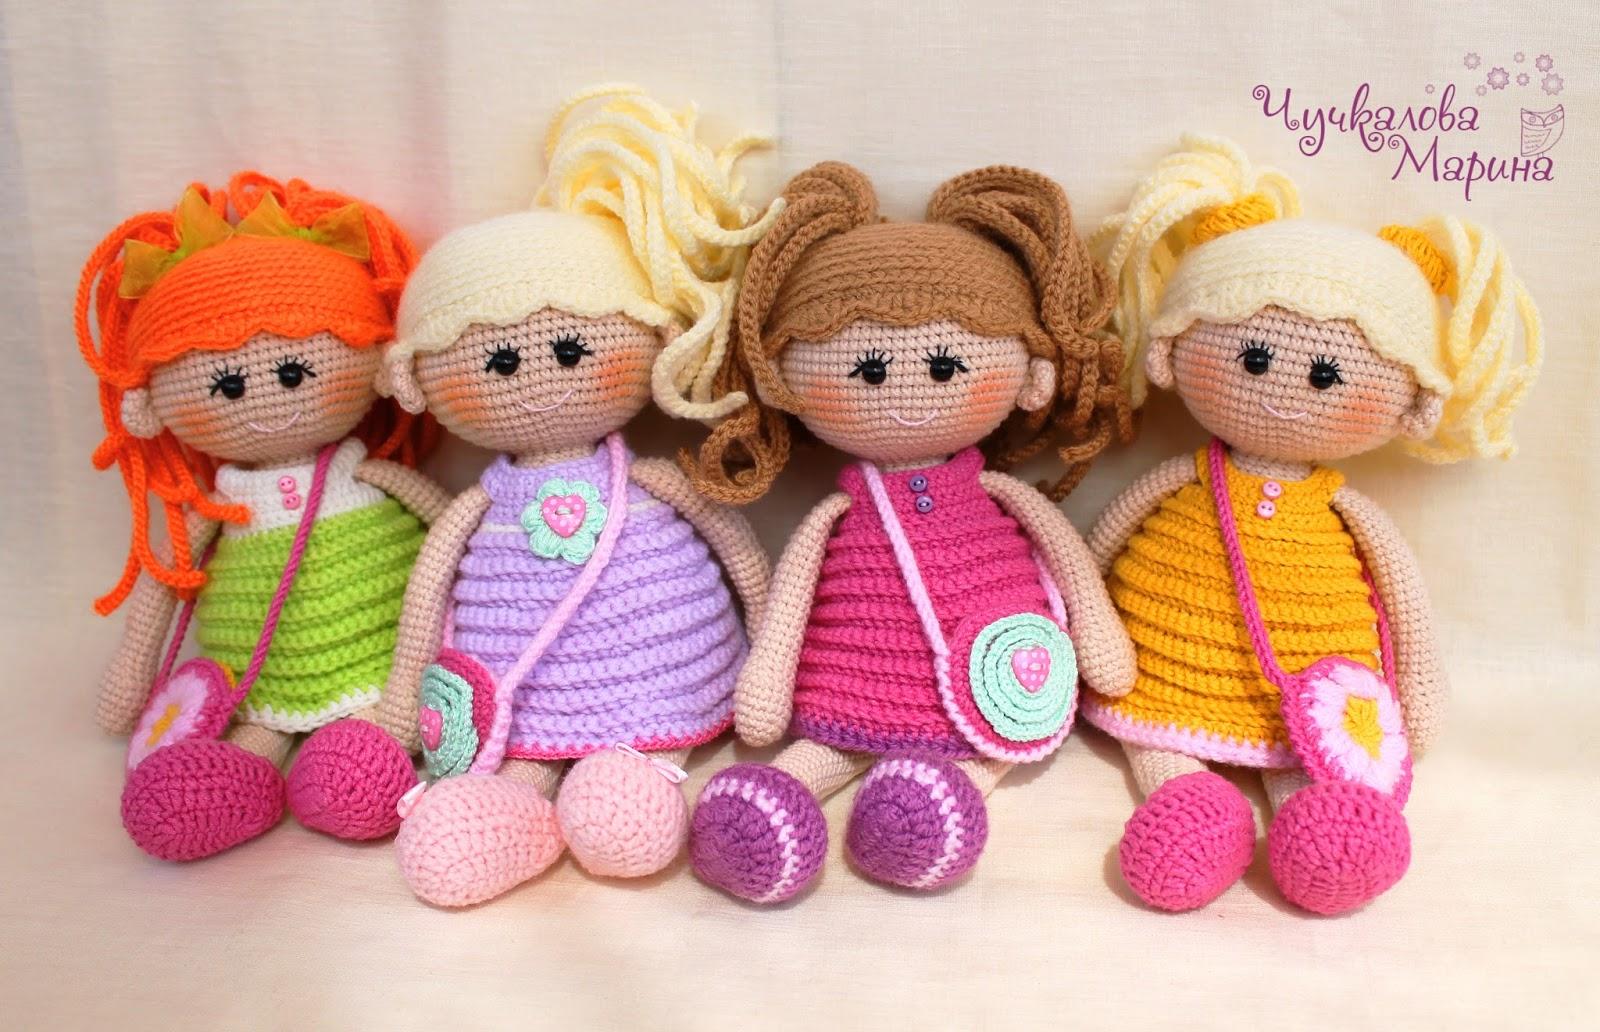 Мастер класс по вязанию амигуруми кукла 120